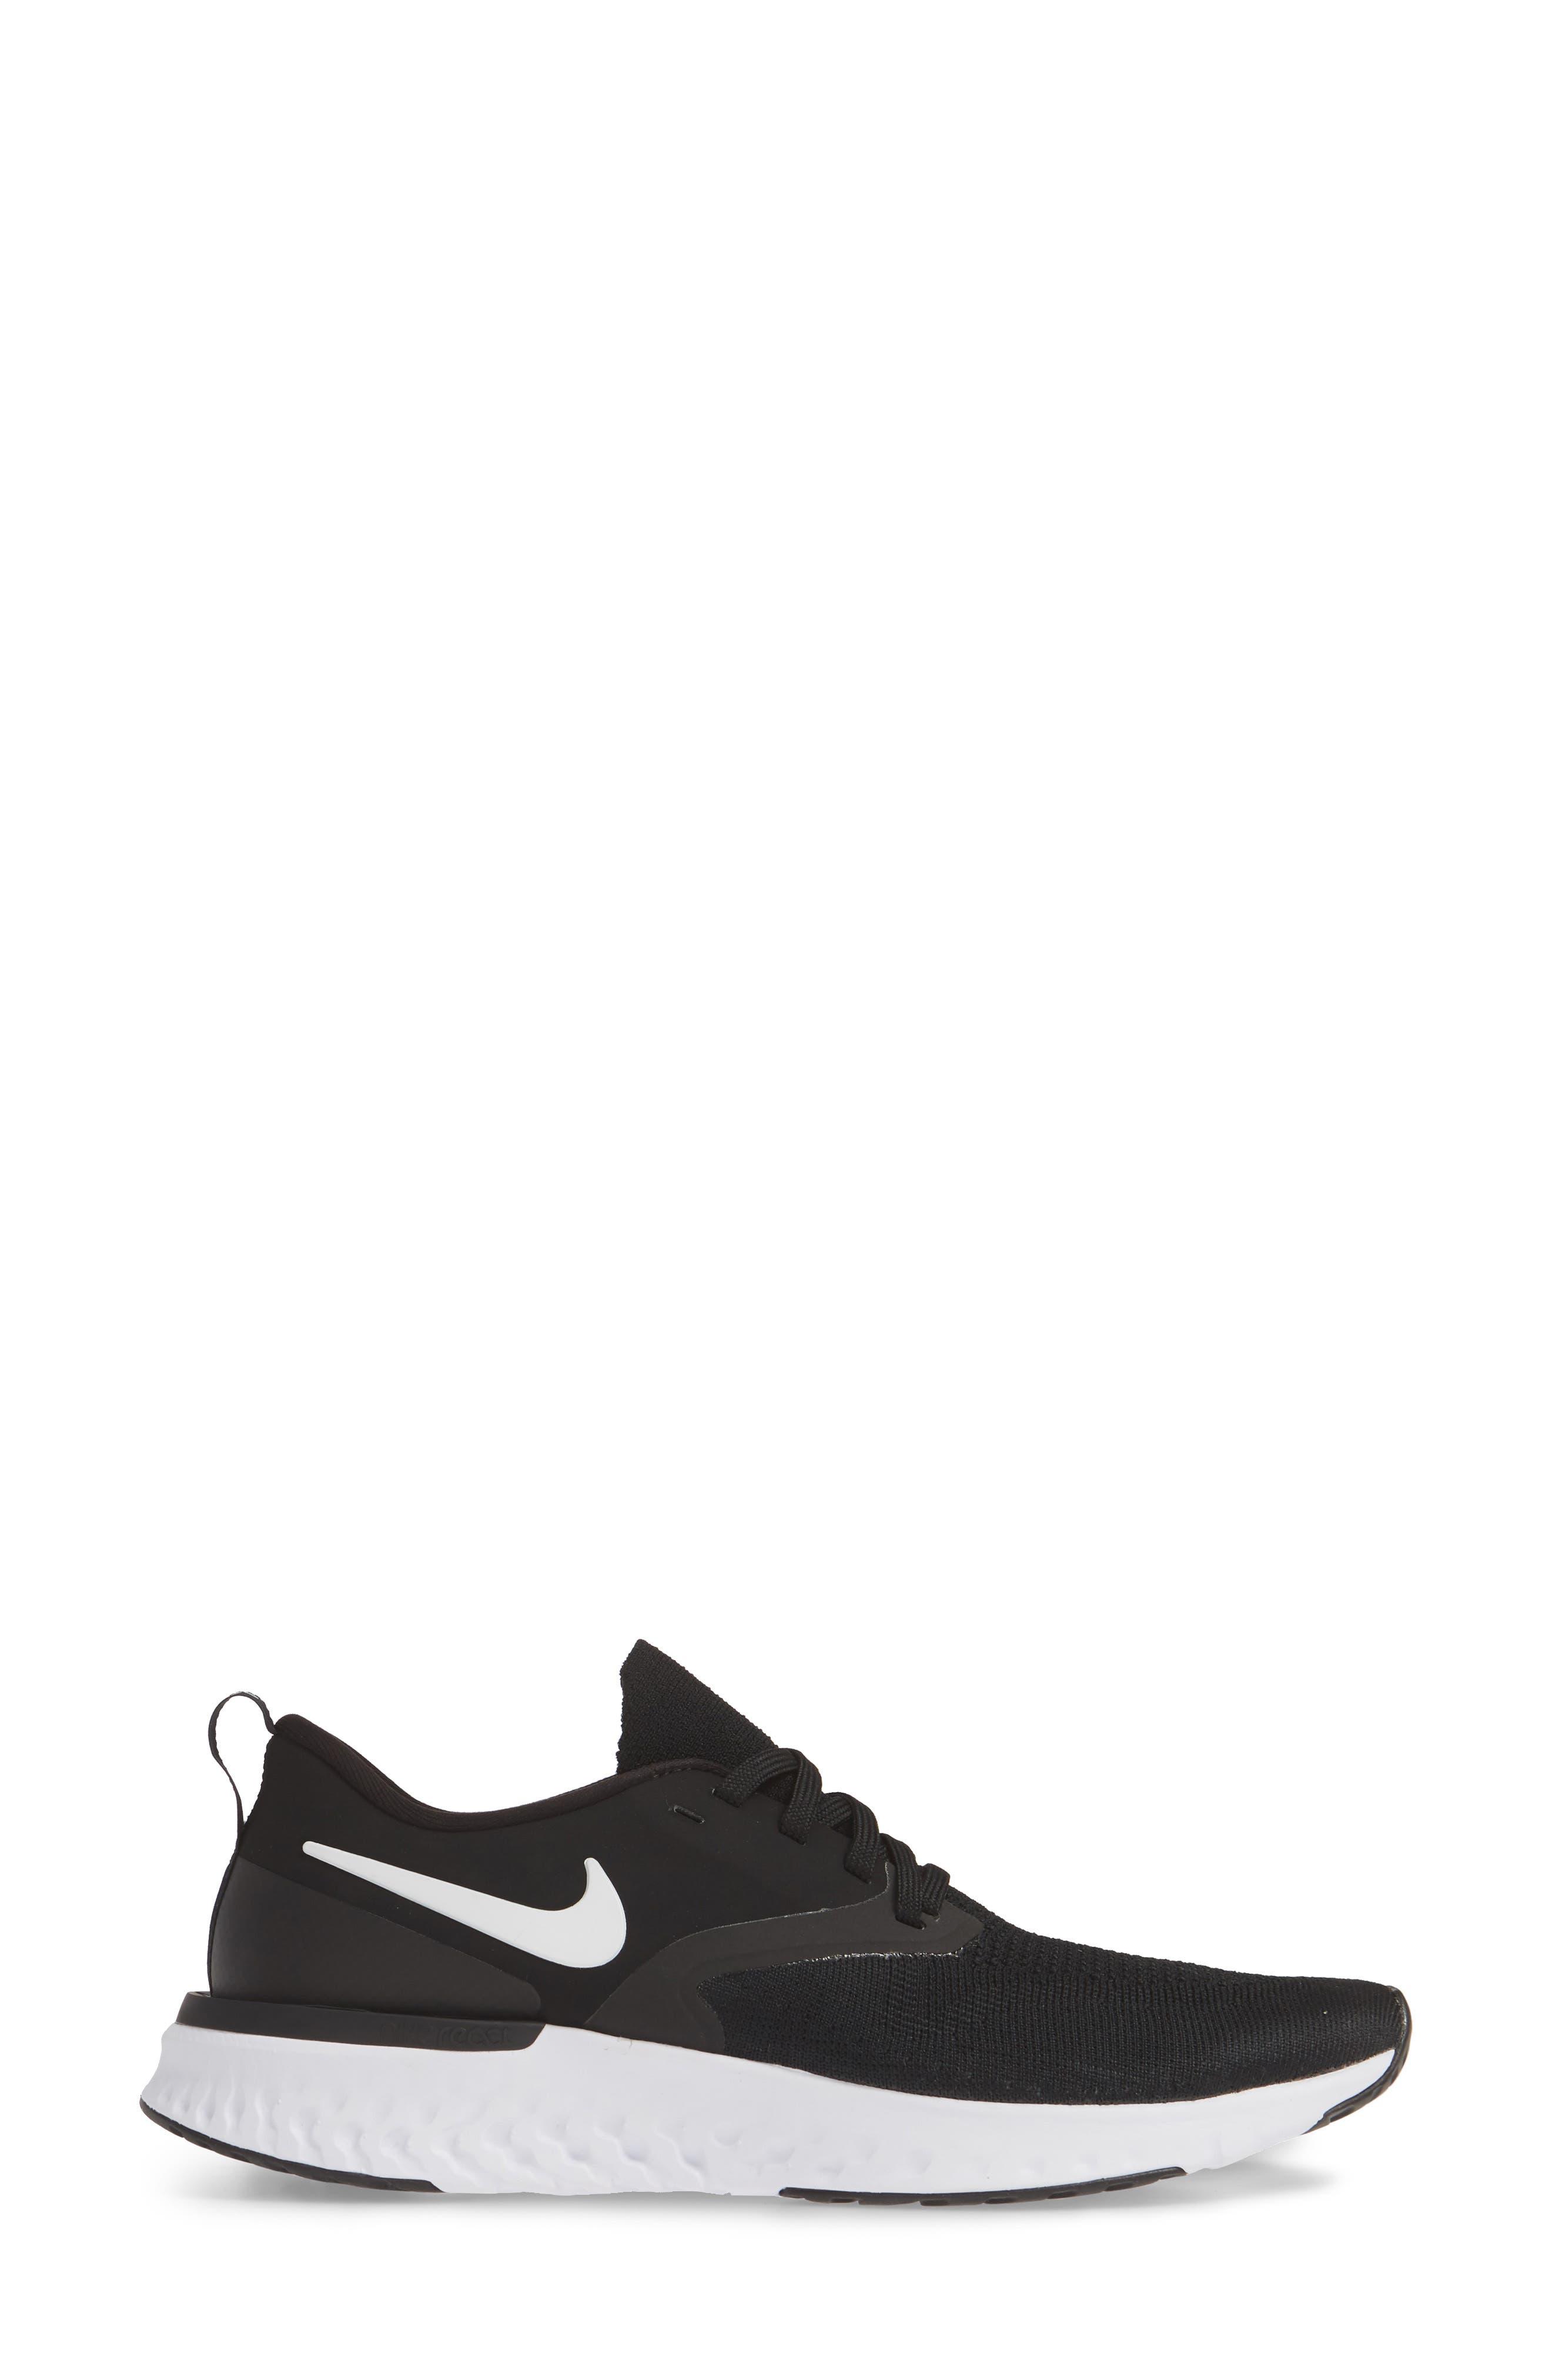 NIKE, Odyssey React 2 Flyknit Running Shoe, Alternate thumbnail 3, color, BLACK/ WHITE